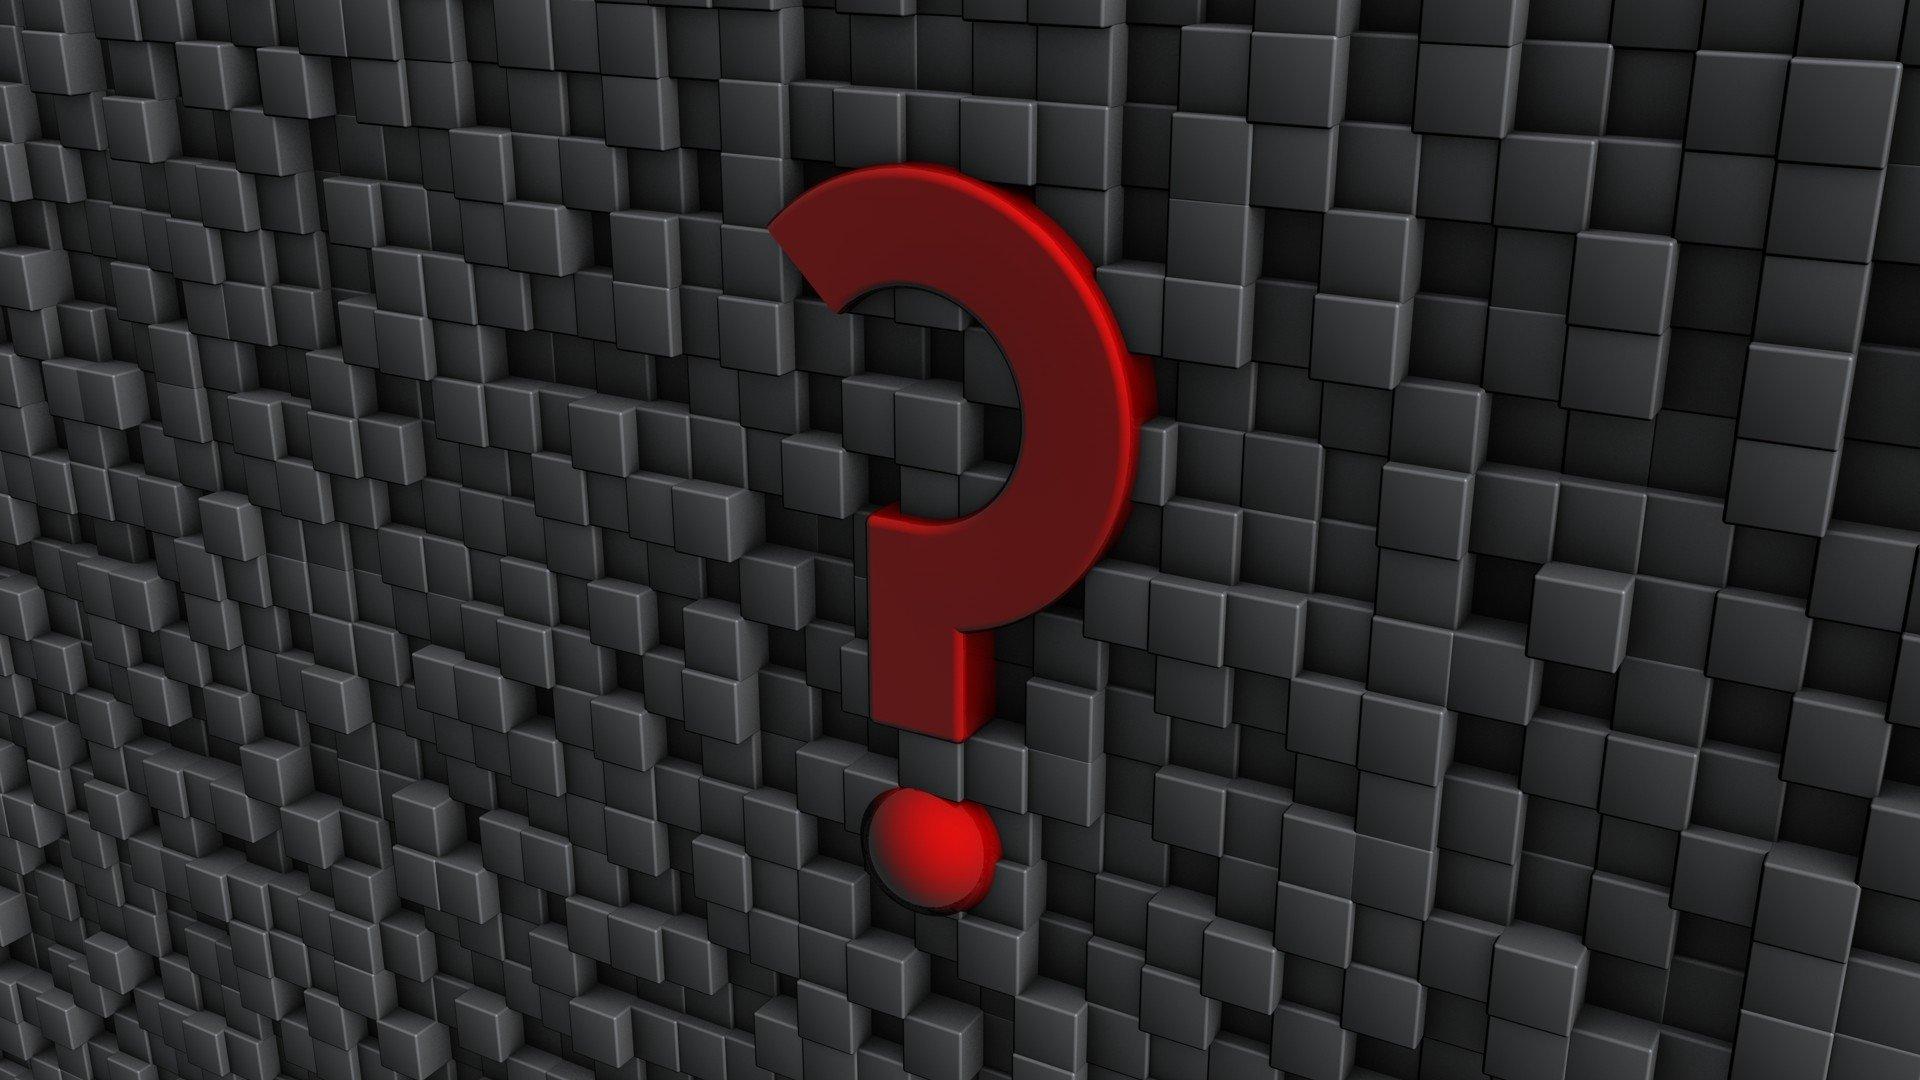 question mark Computer Wallpapers Desktop Backgrounds 1920x1080 1920x1080